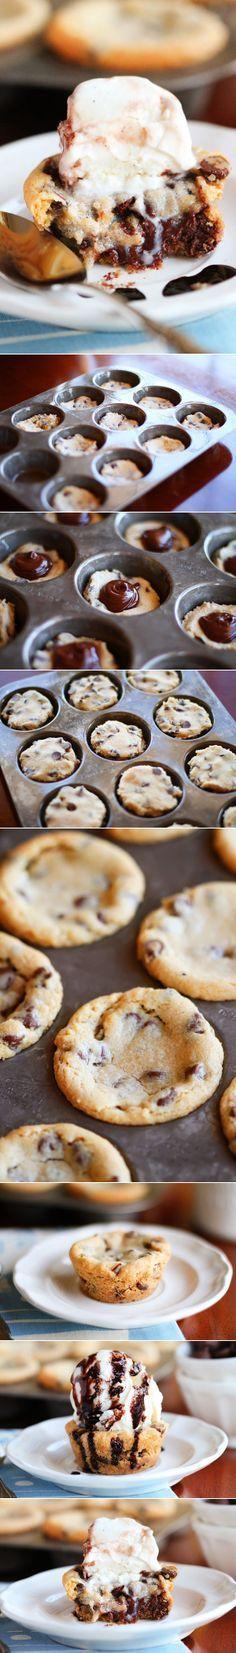 Chocolate Chip Lava Cookies!